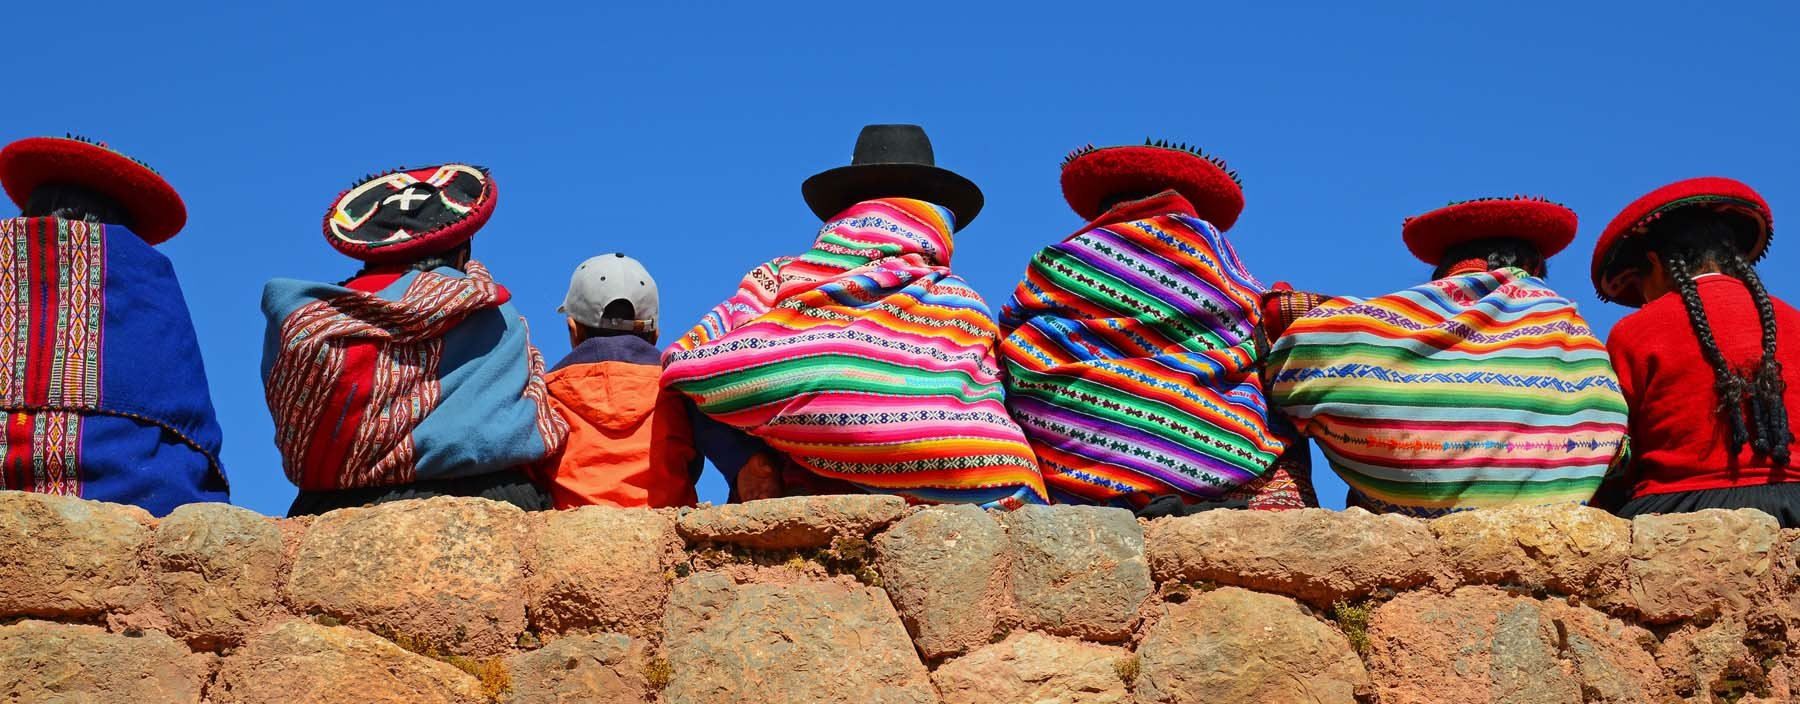 Peruaanse kledij